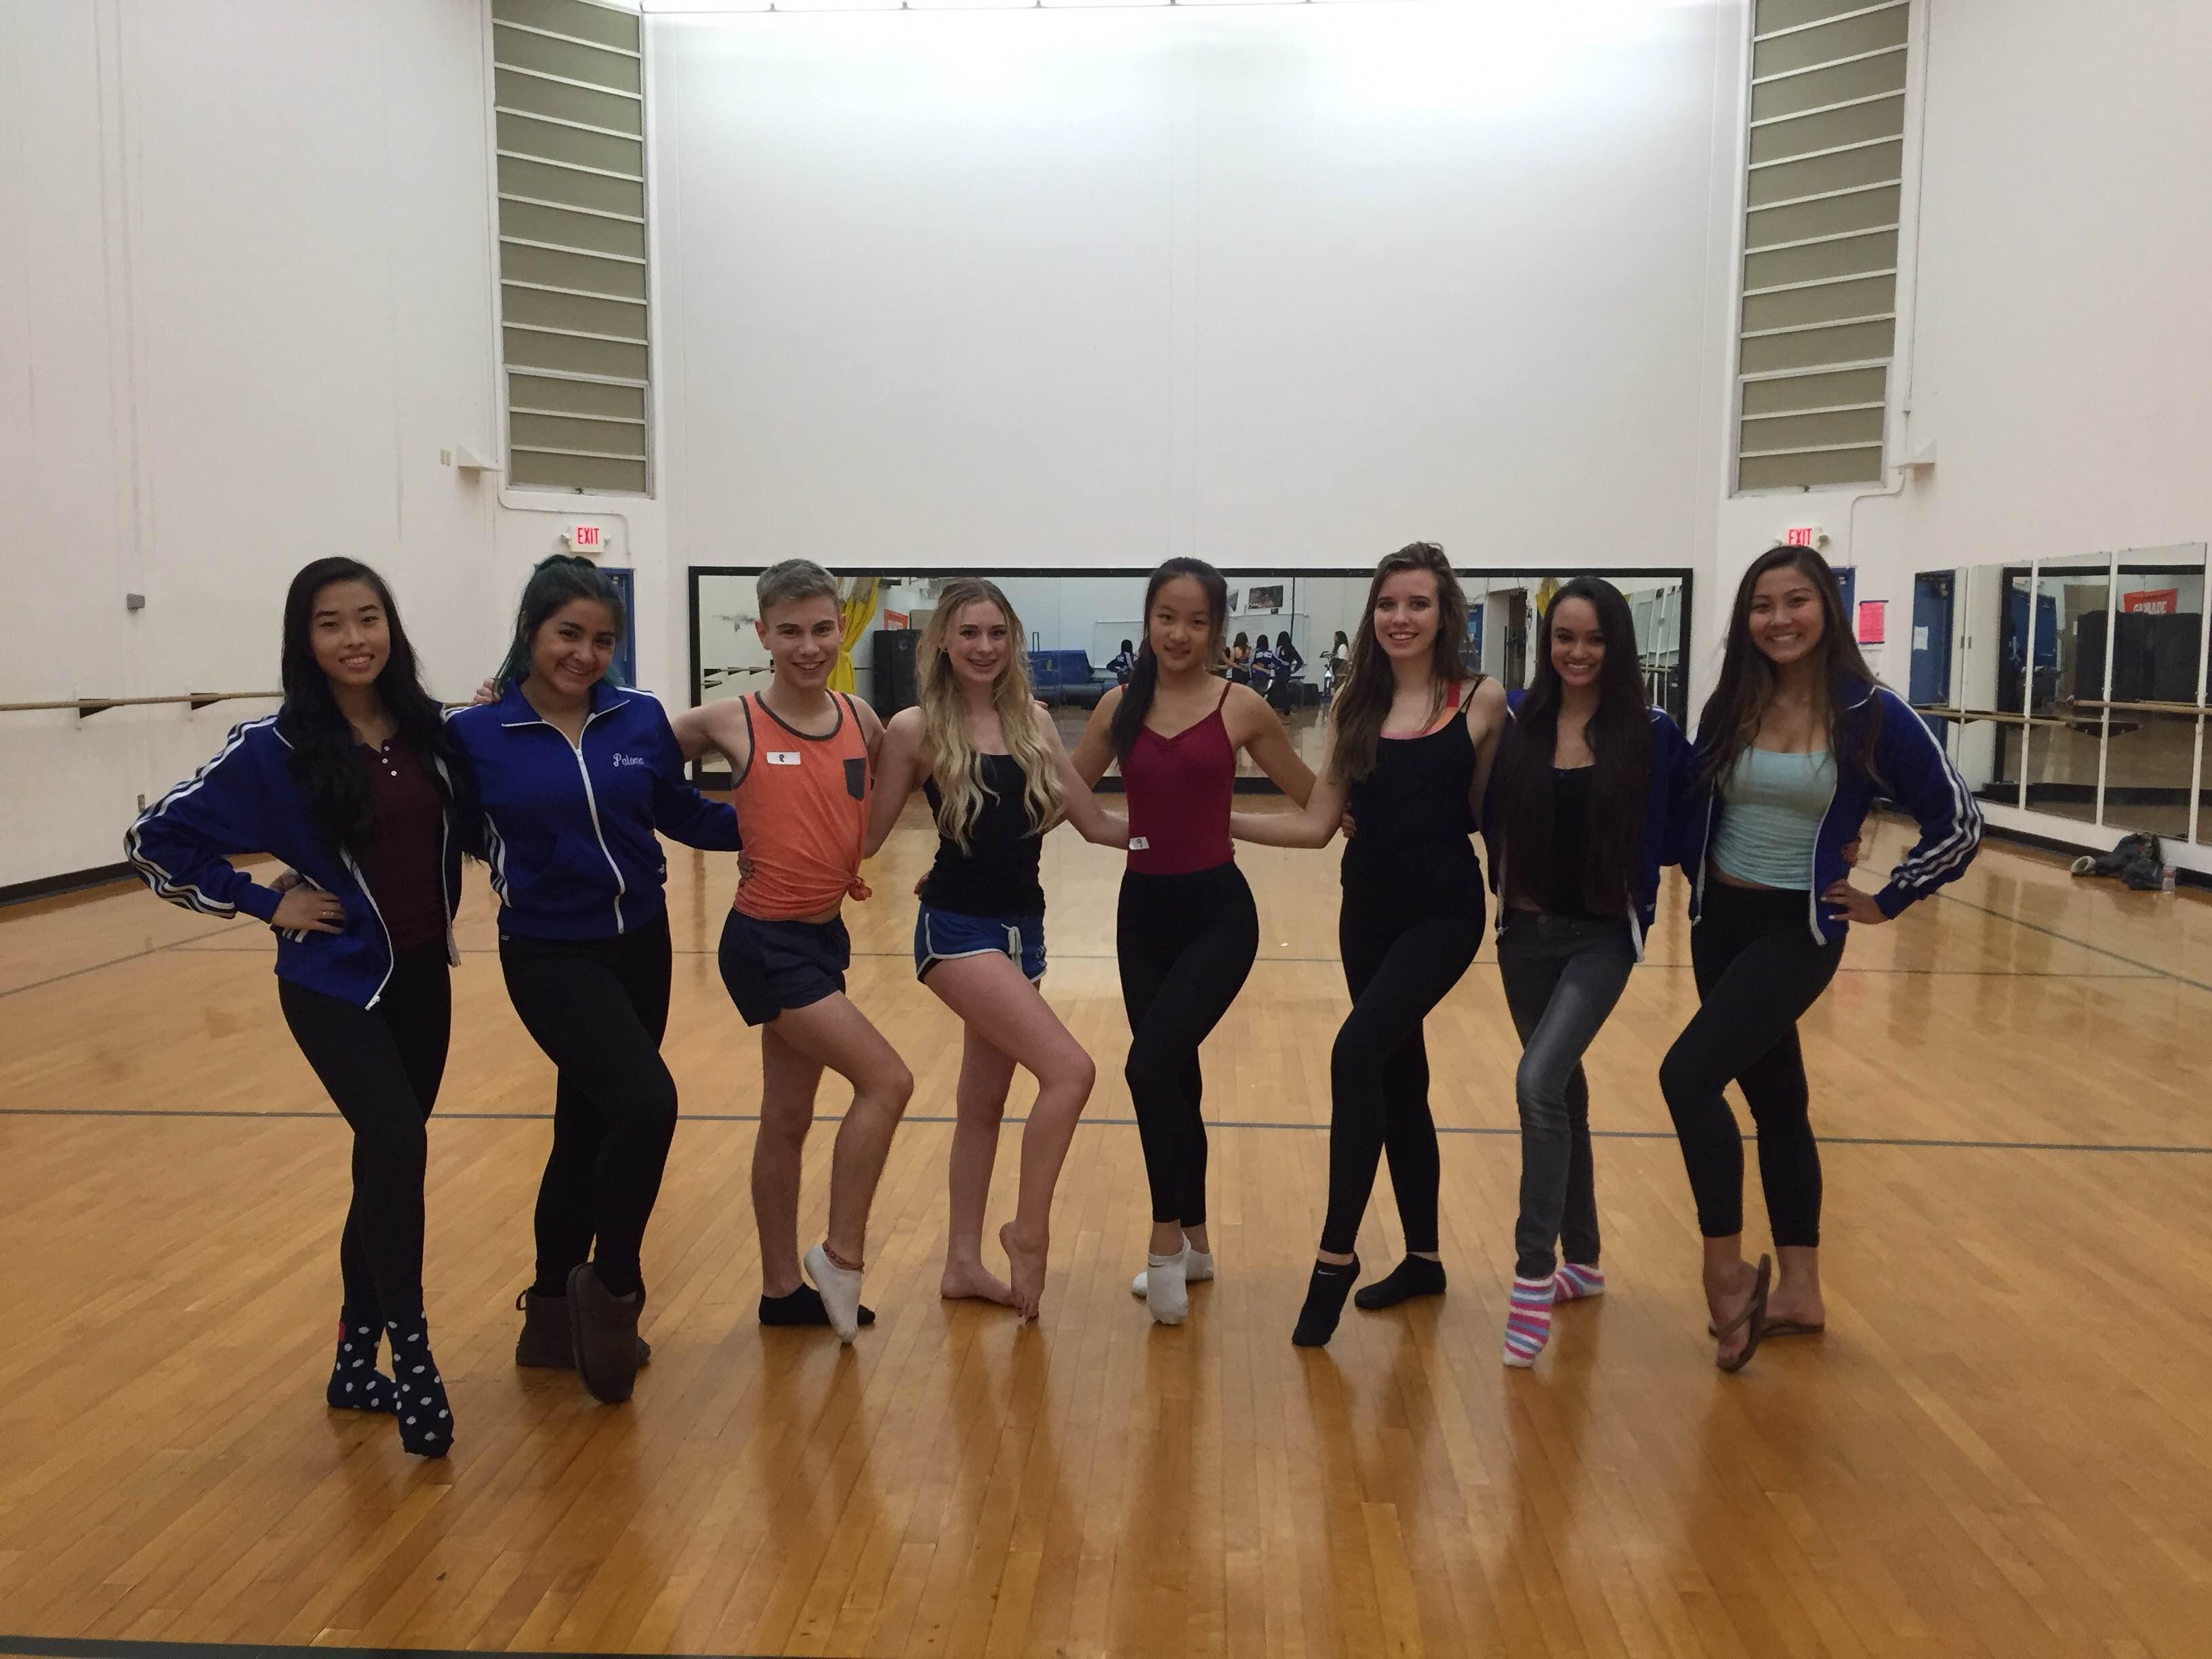 Tags Dance Teams New Members: New Dance Team Members Selected